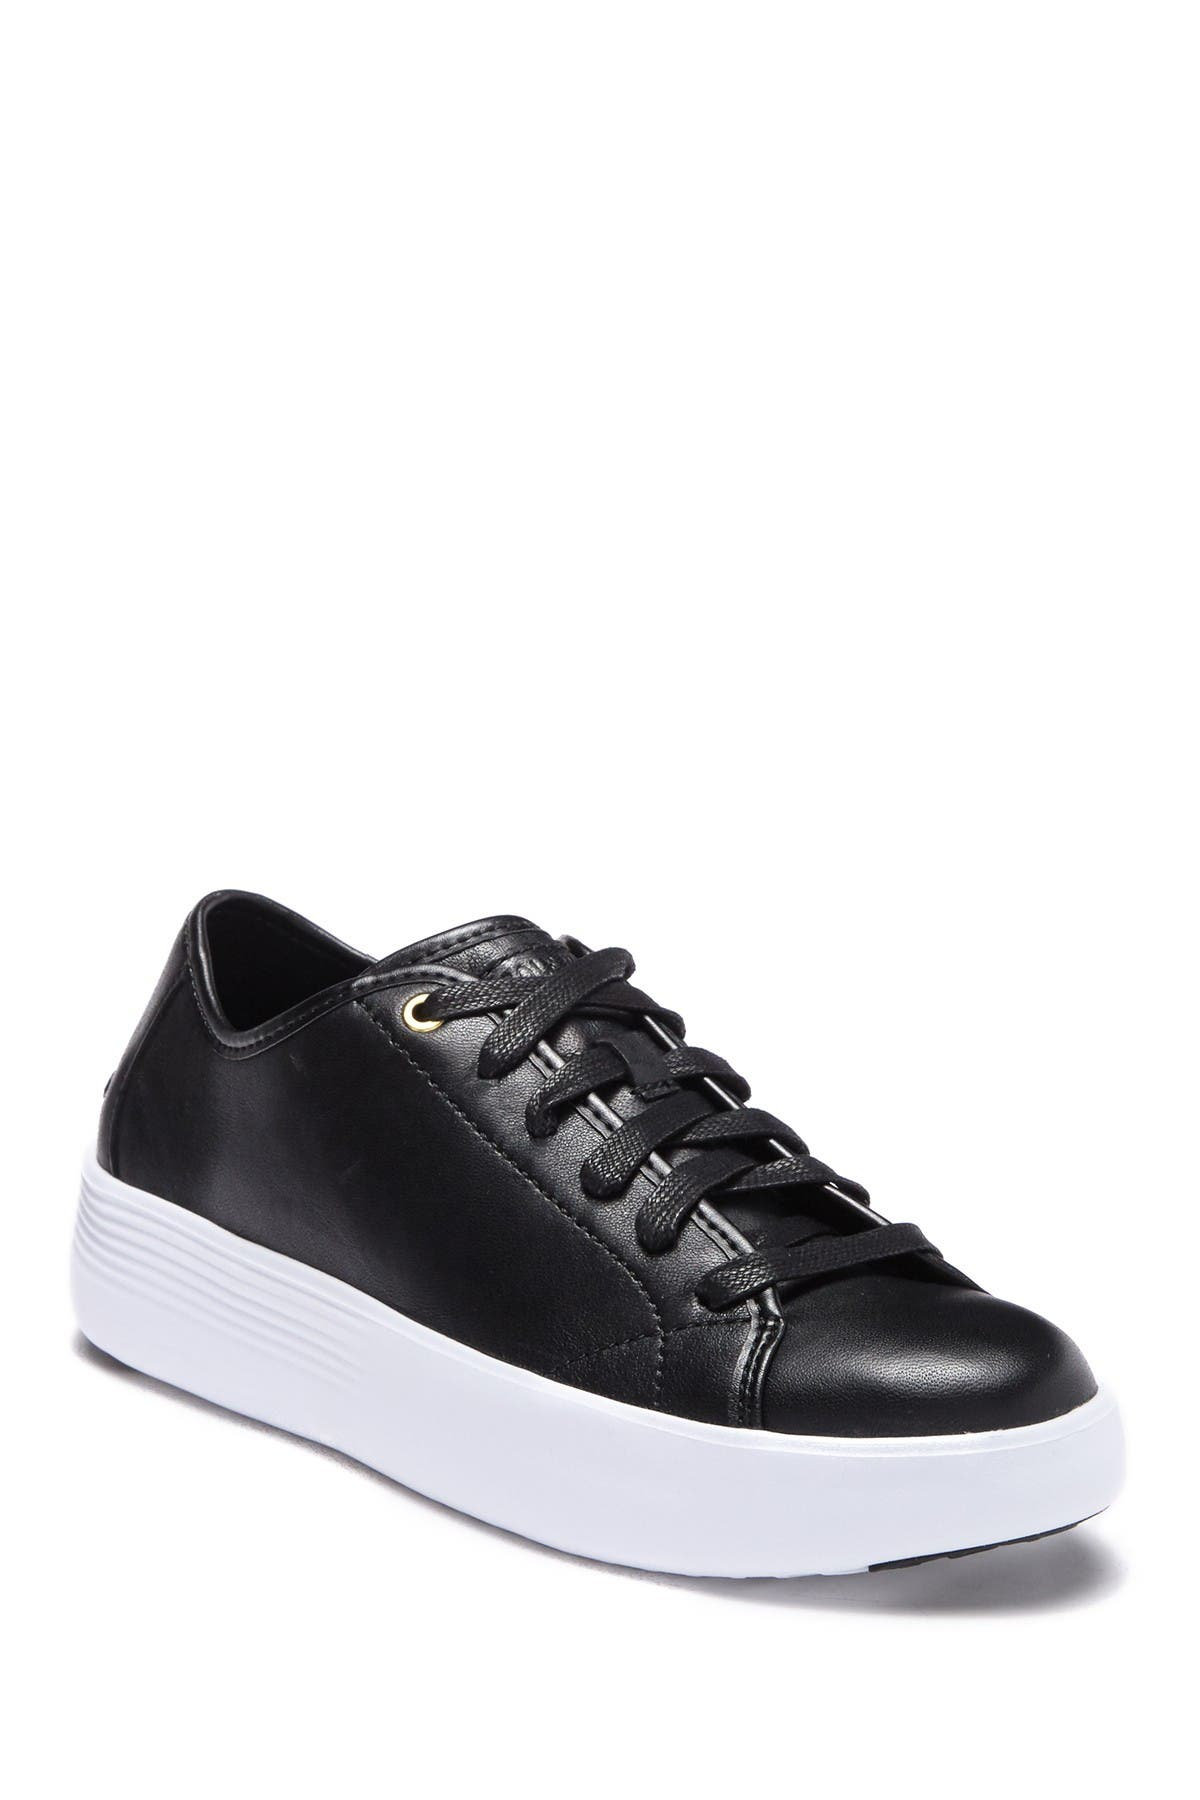 Grand Court Leather Platform Sneaker